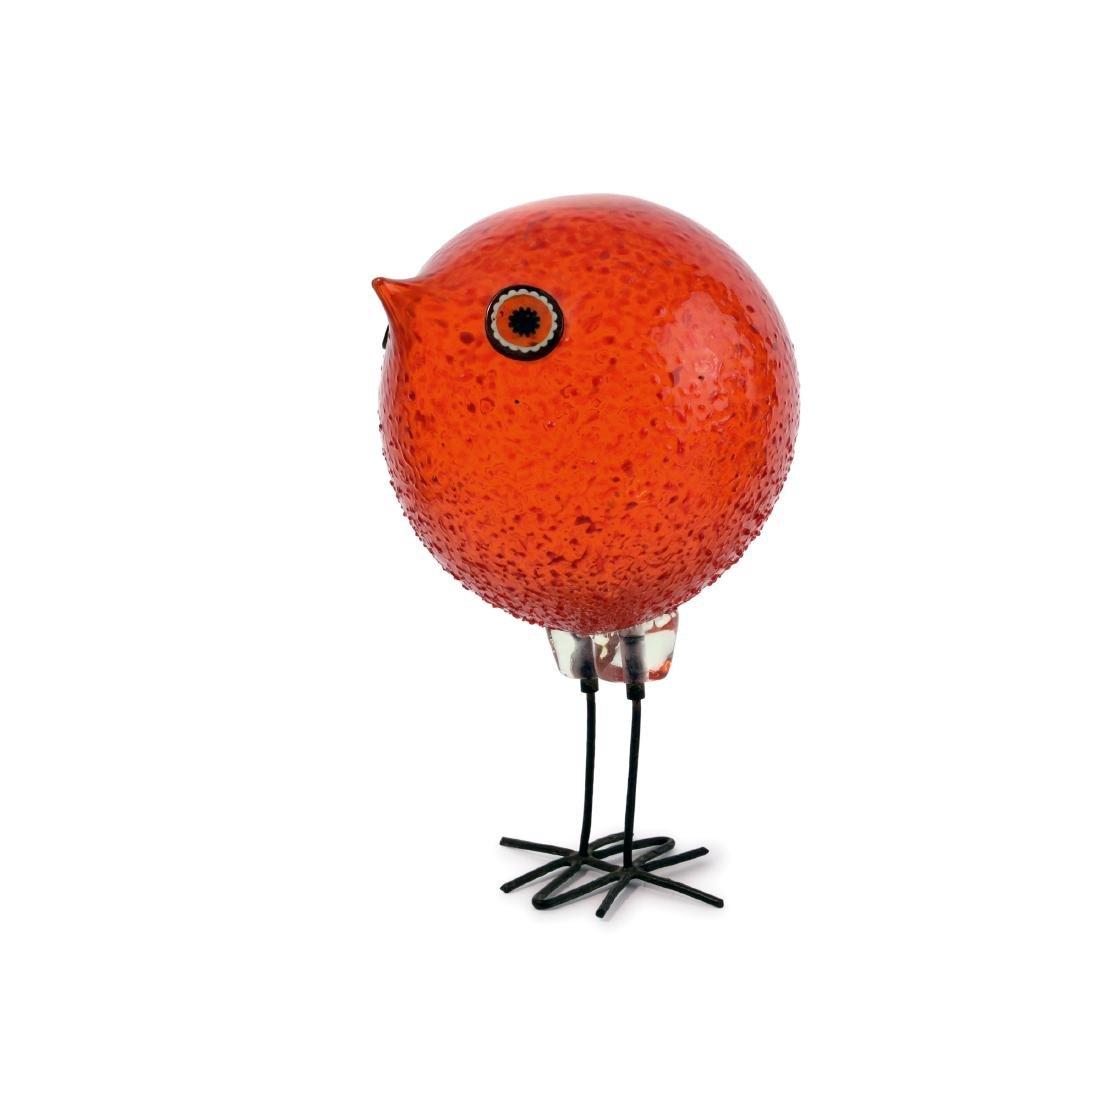 'Pulcino' bird, 1962